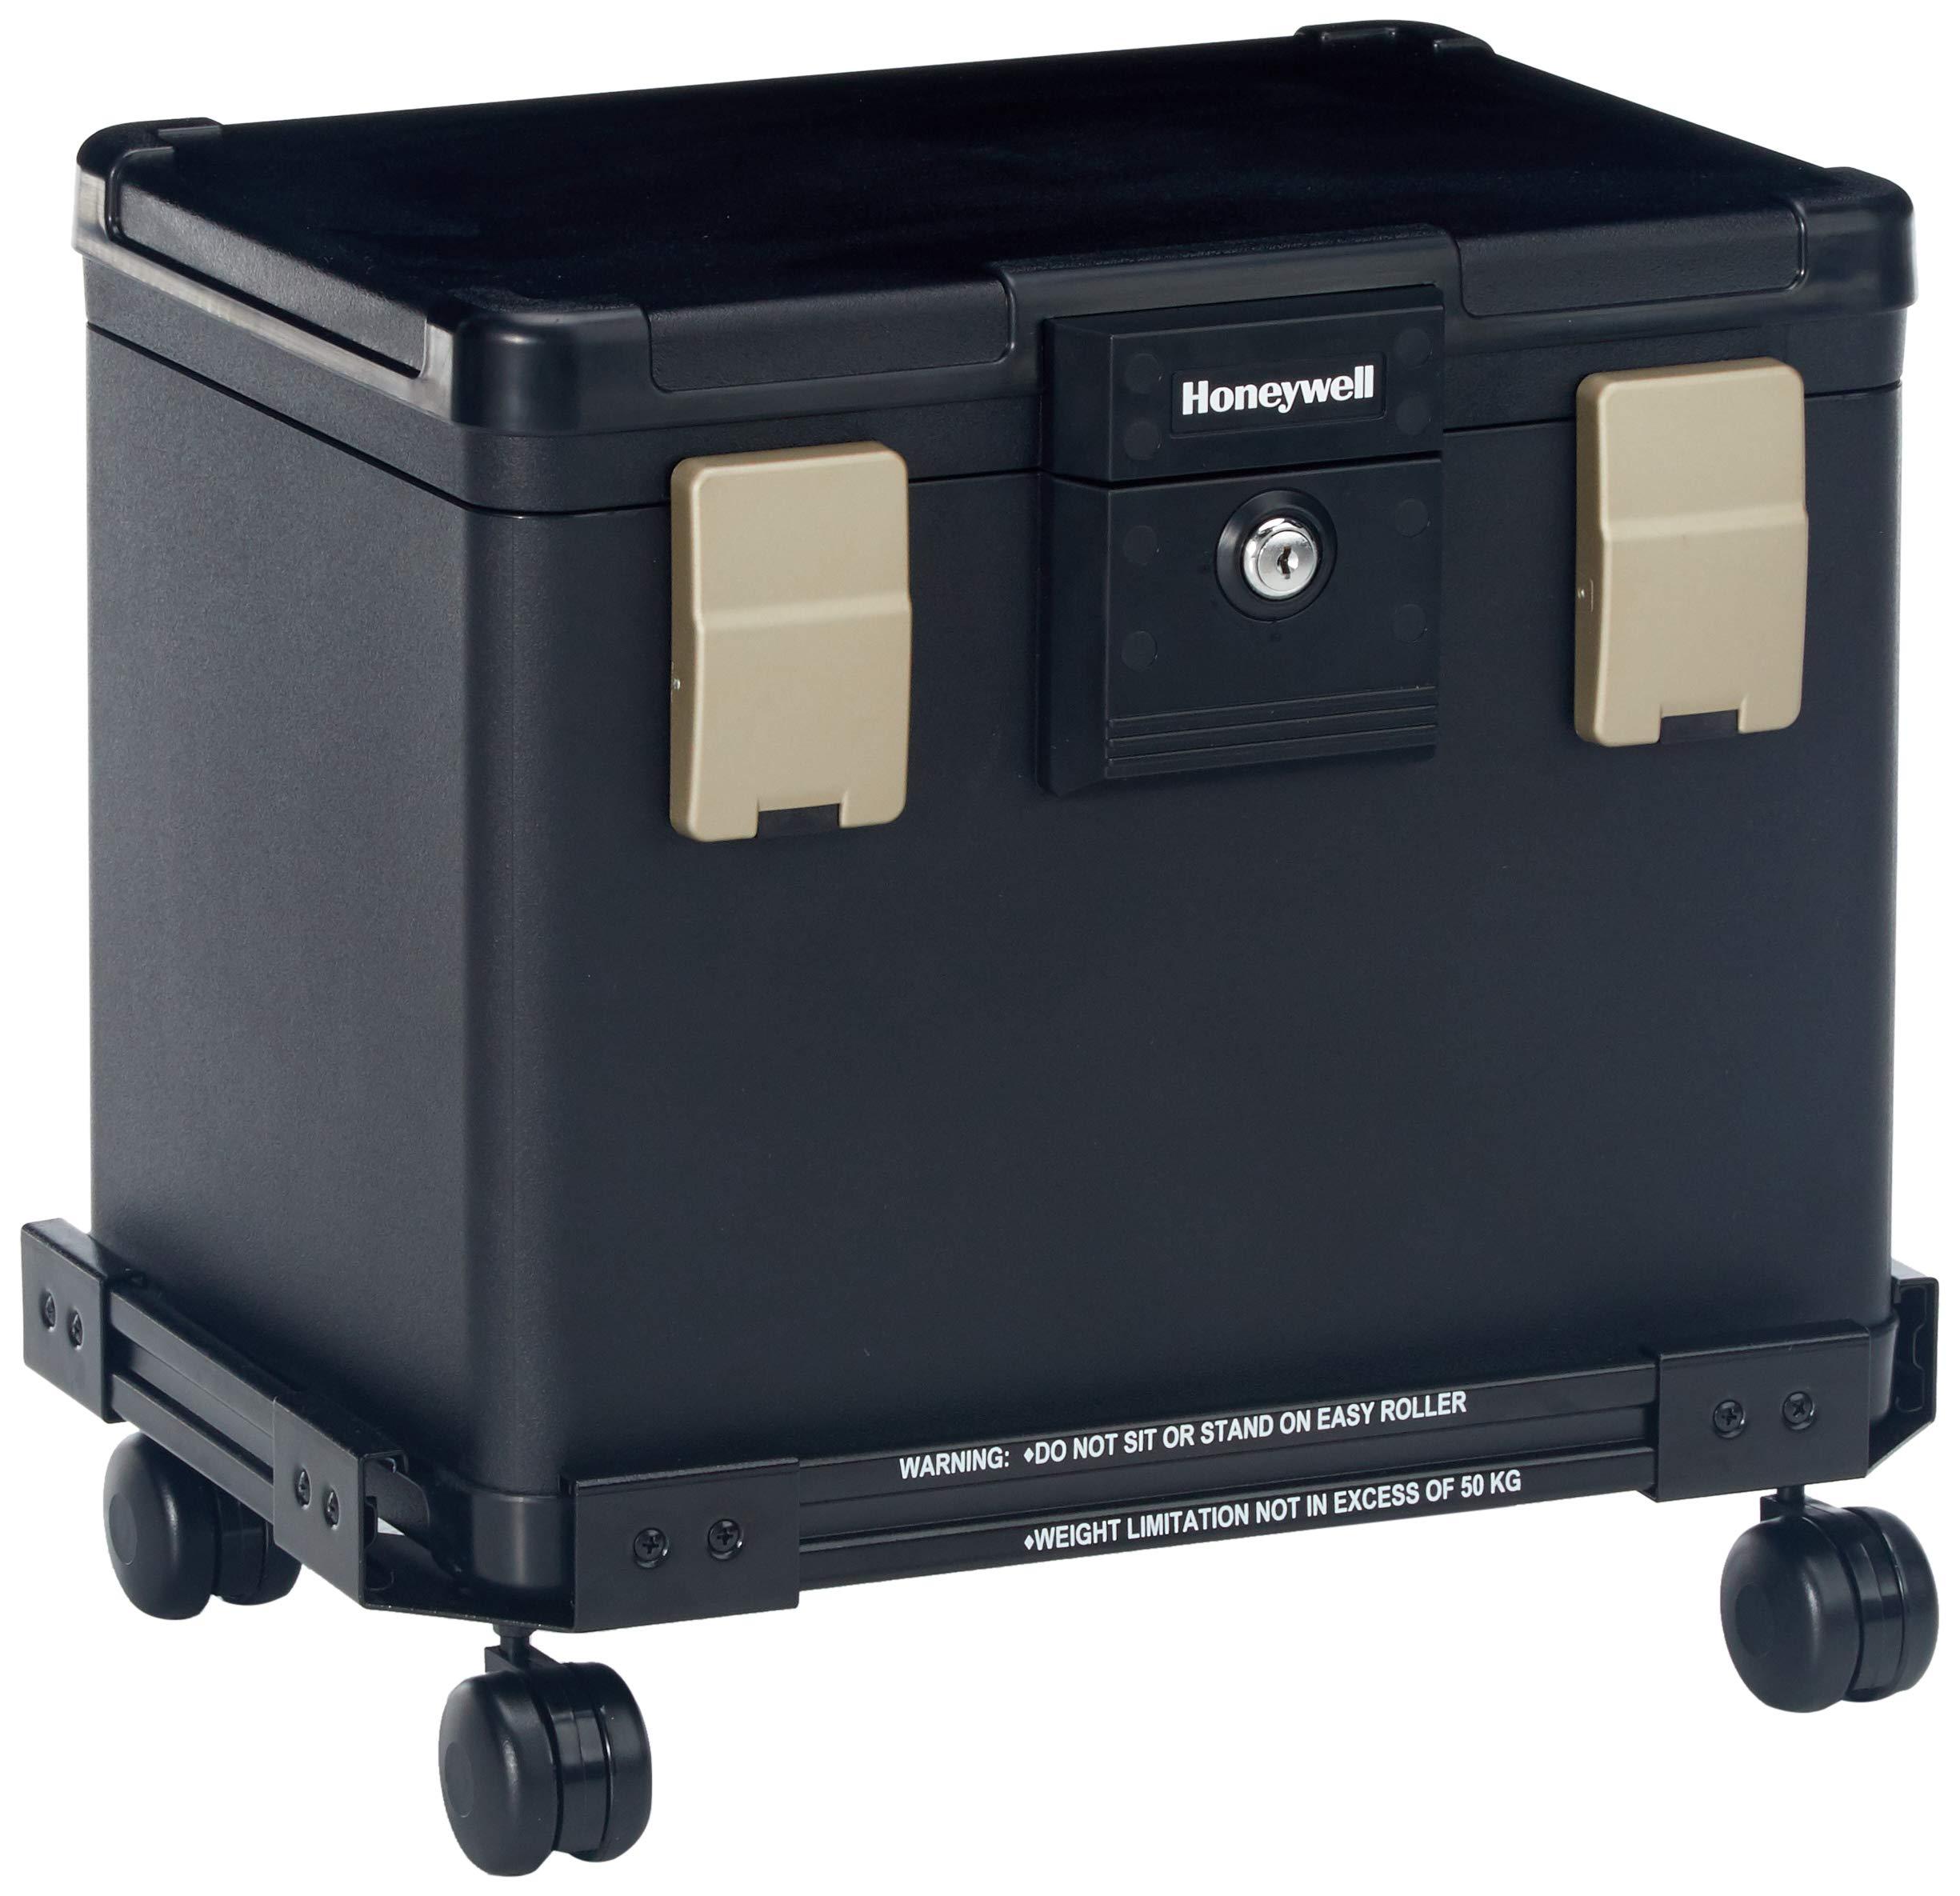 Honeywell Safes & Door Locks - Honeywell Safes & Door Locks Fire Waterproof Filing Safe Box Chest with Wheel Cart 1106W, Medium by Honeywell Safes & Door Locks